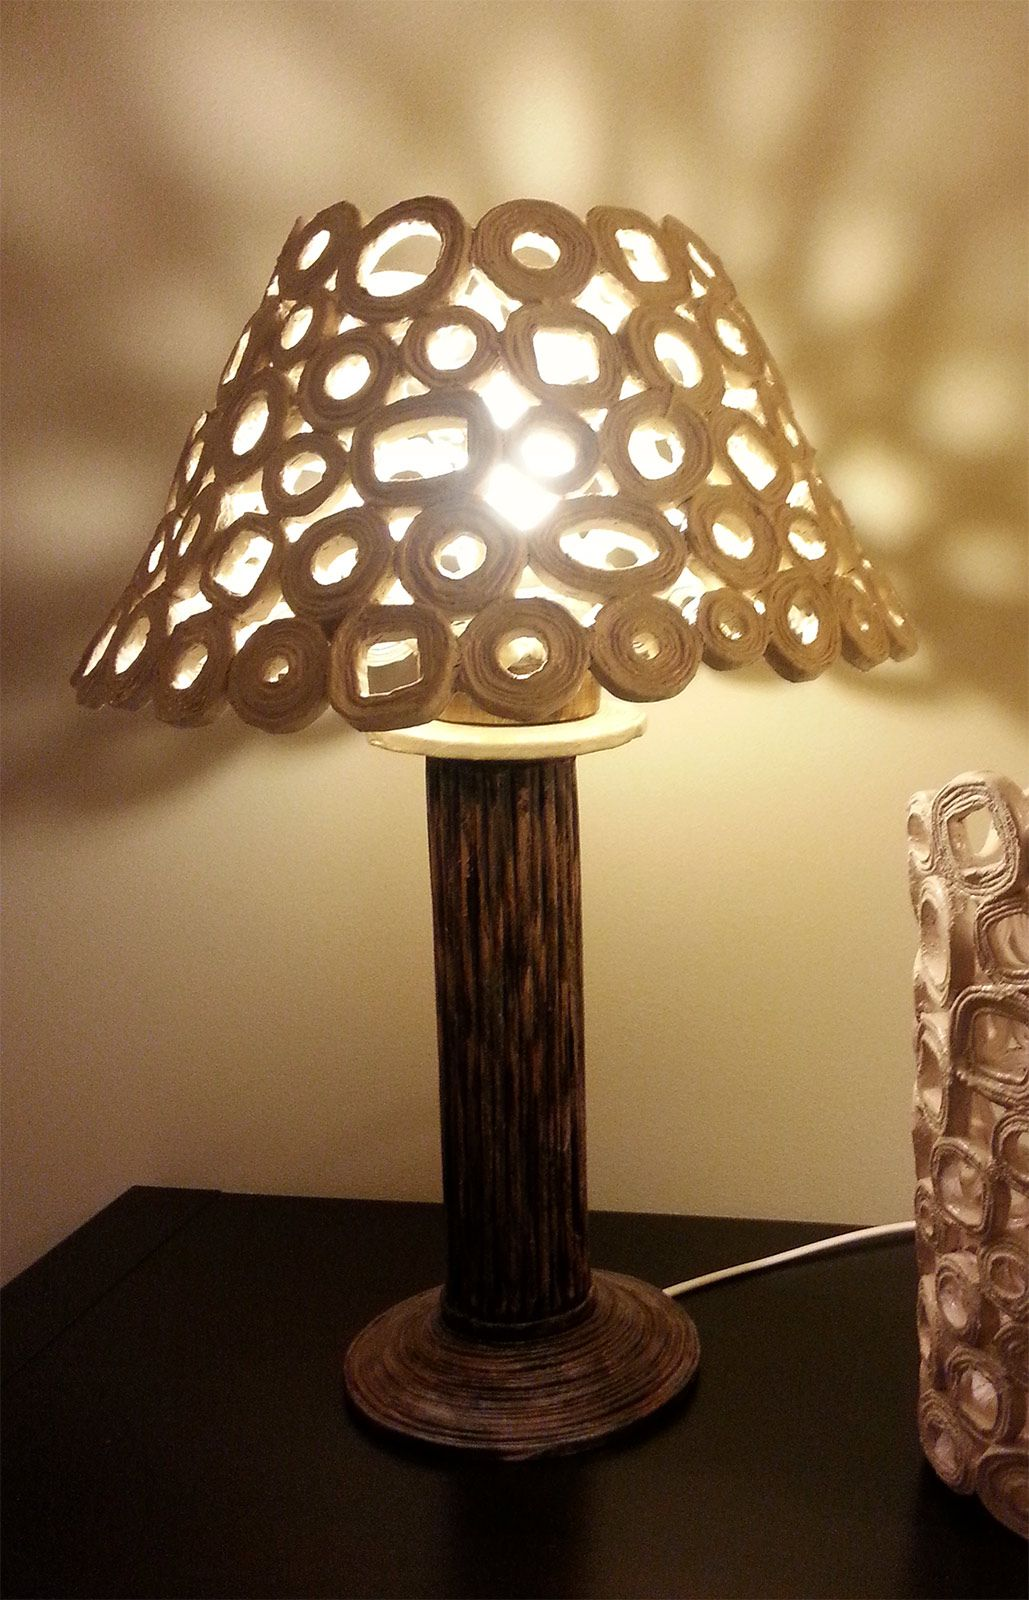 lampada da tavolo: paralume con carta da riciclo